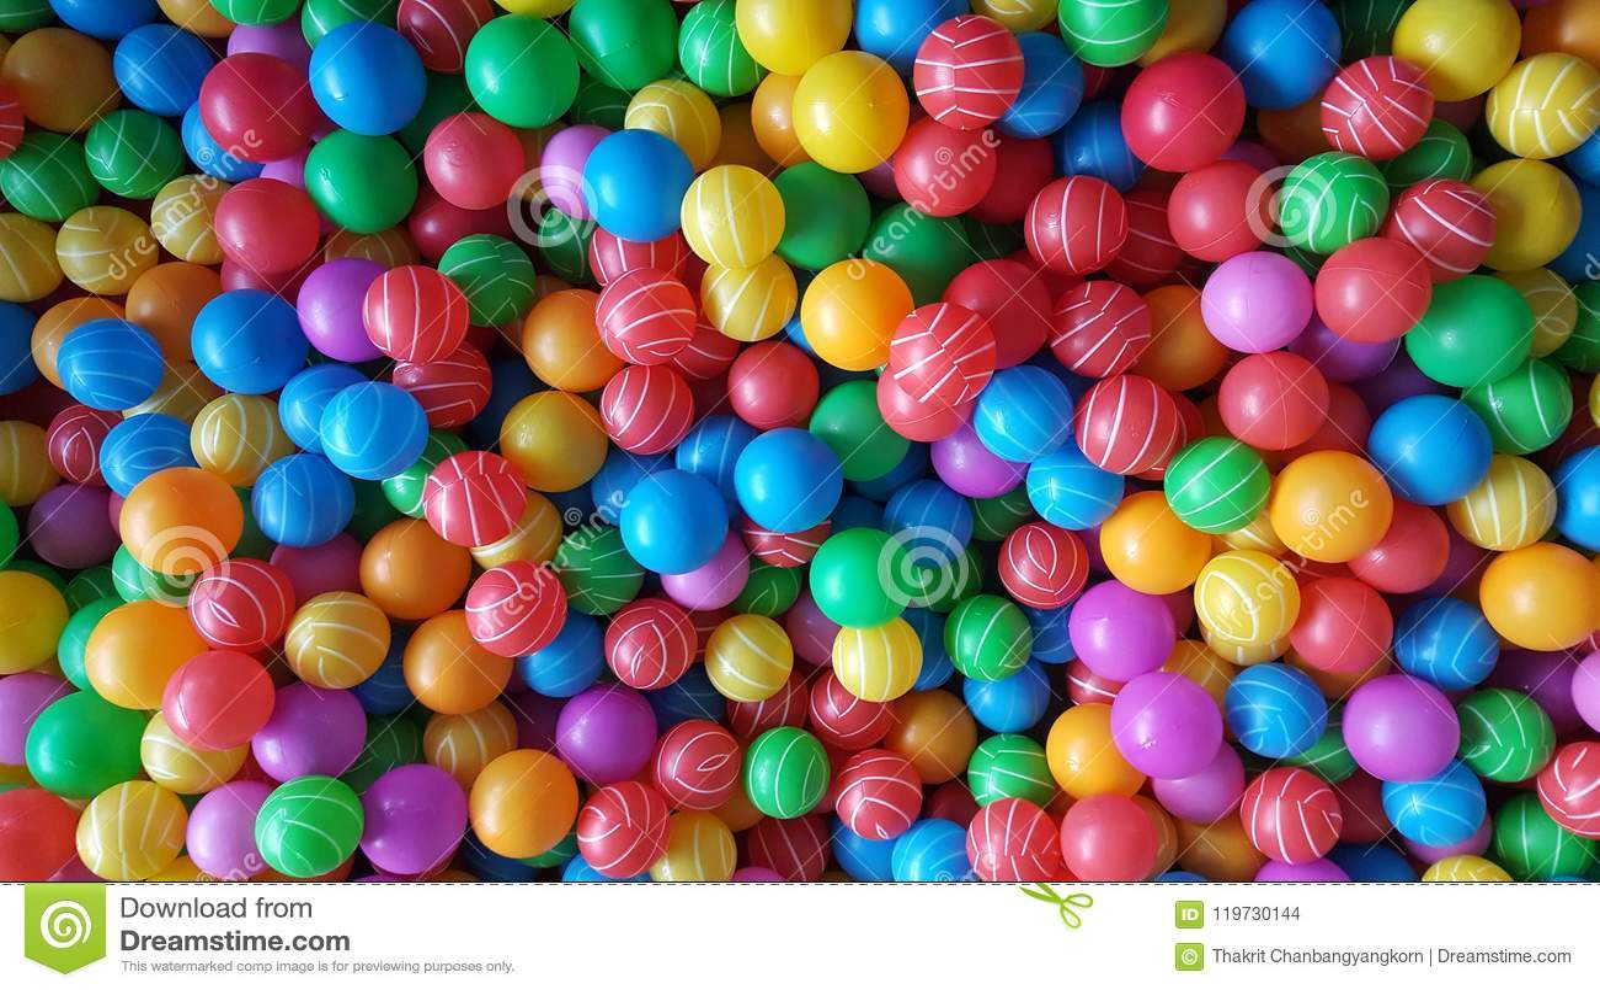 Many colorful balls